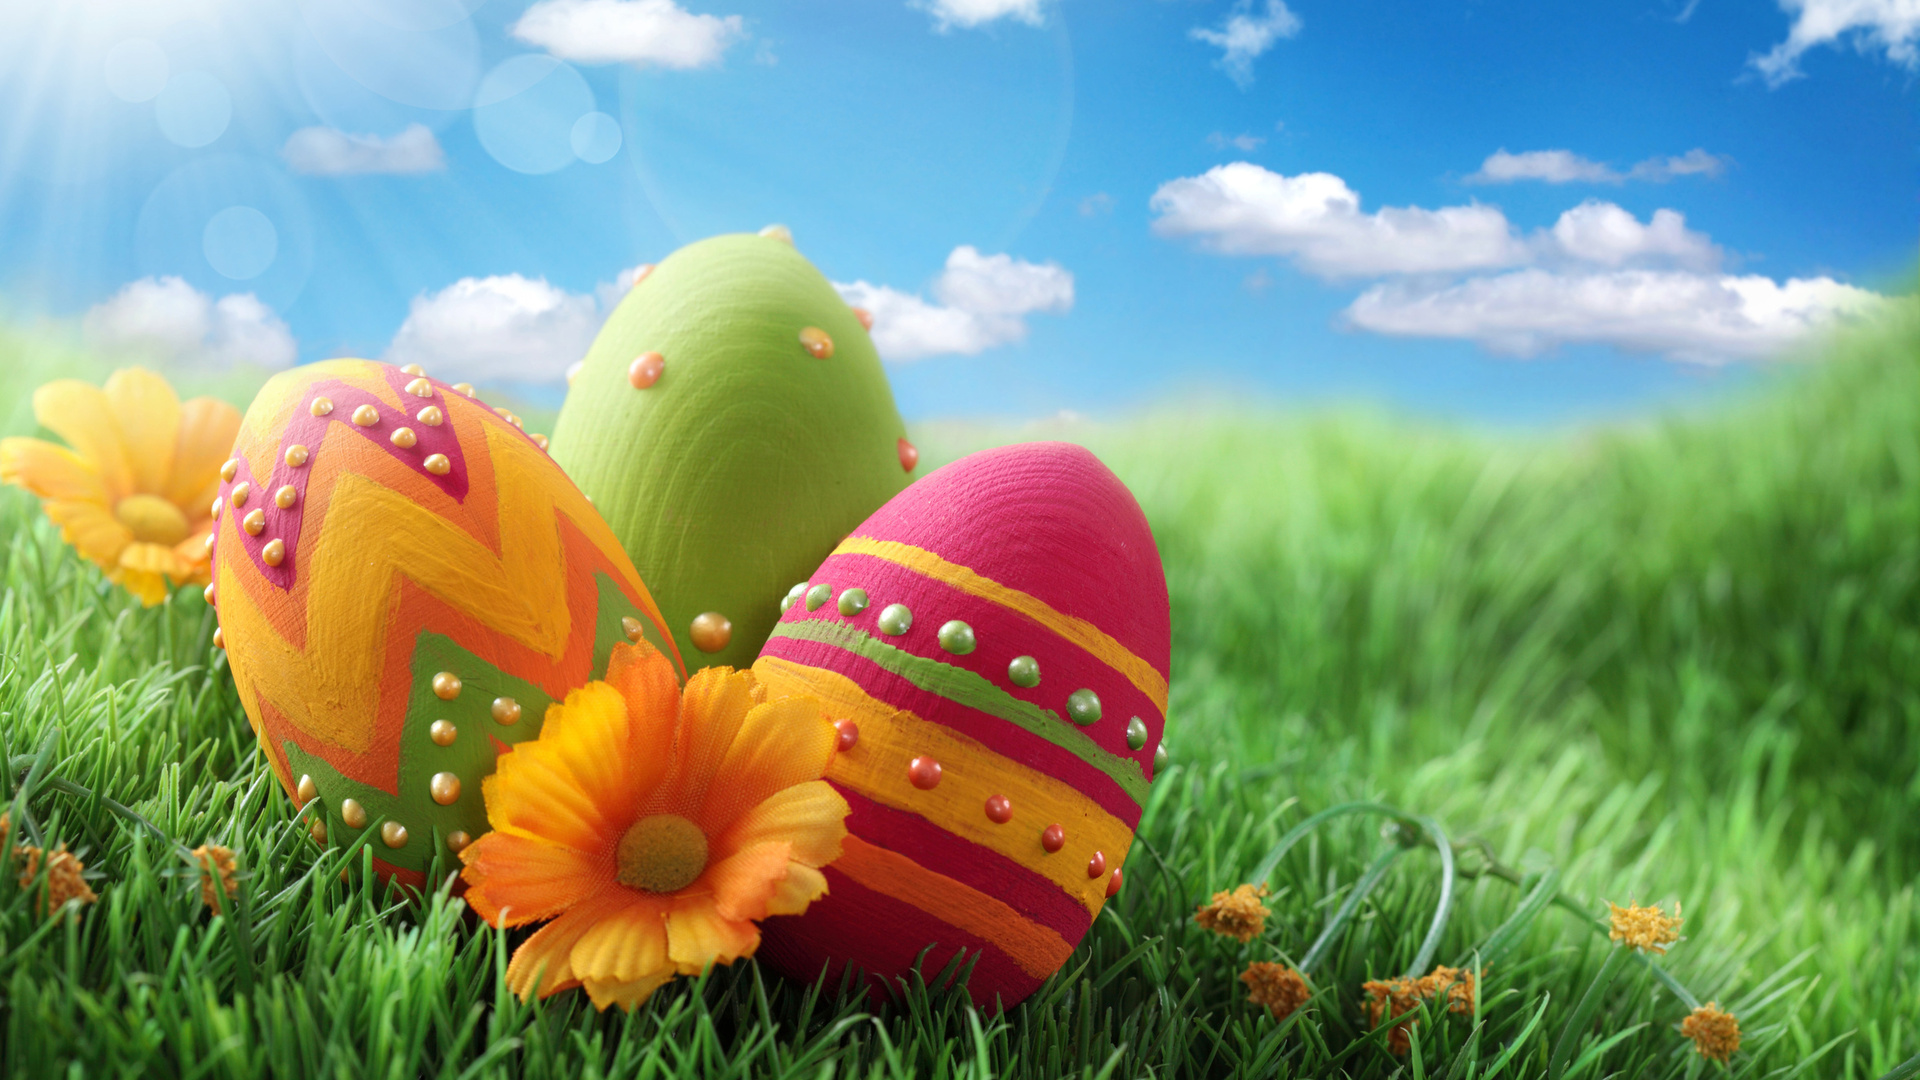 Easter HD wallpaper 1920x1080 26382 1920x1080